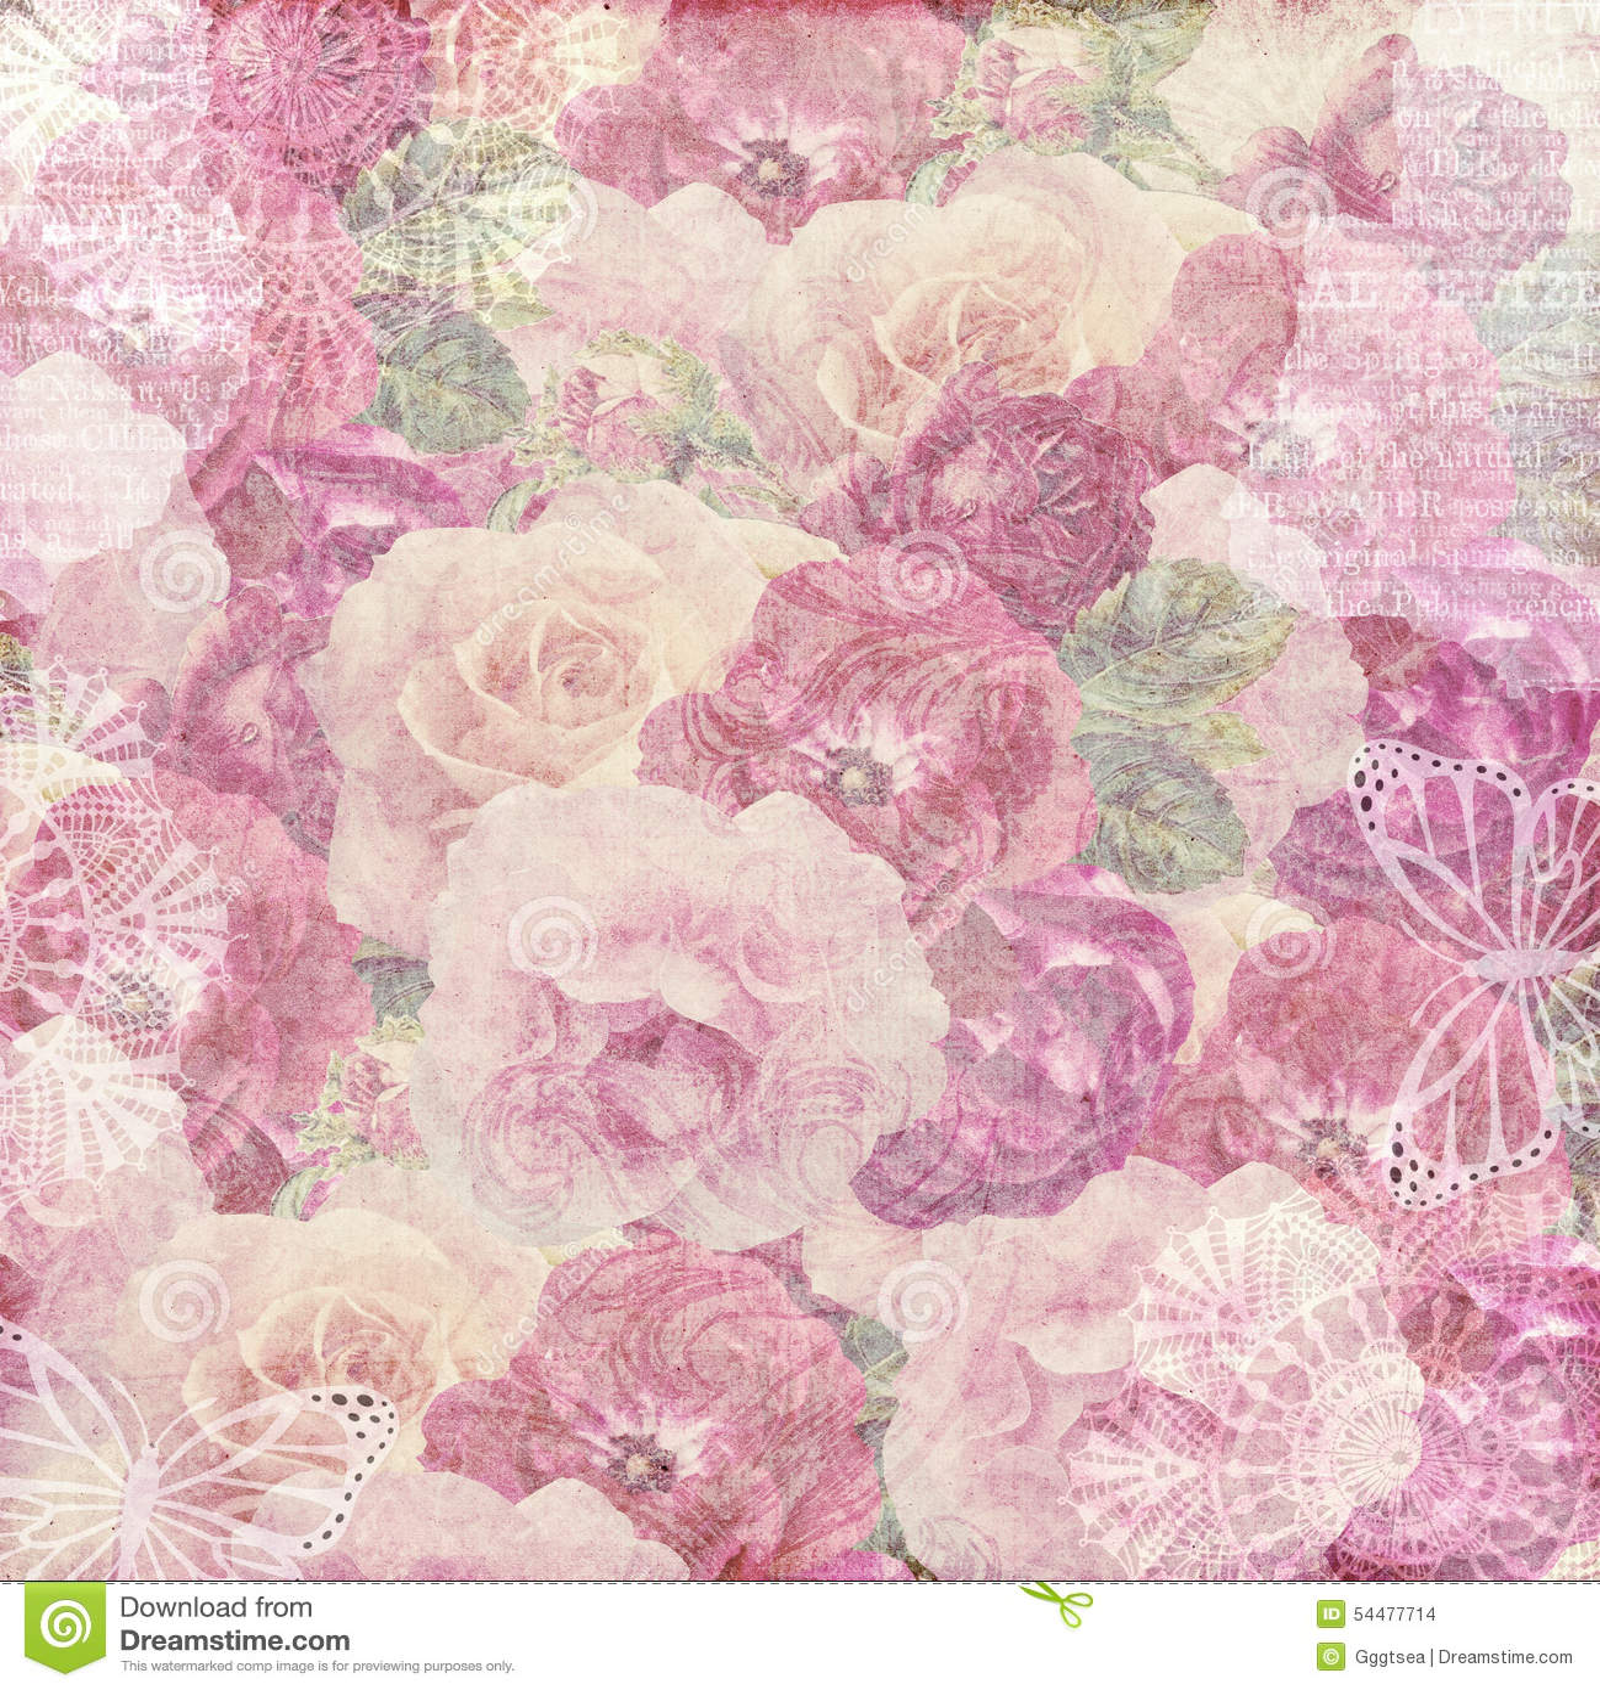 Flower grungy paper background stock illustration illustration of flower grungy paper background mightylinksfo